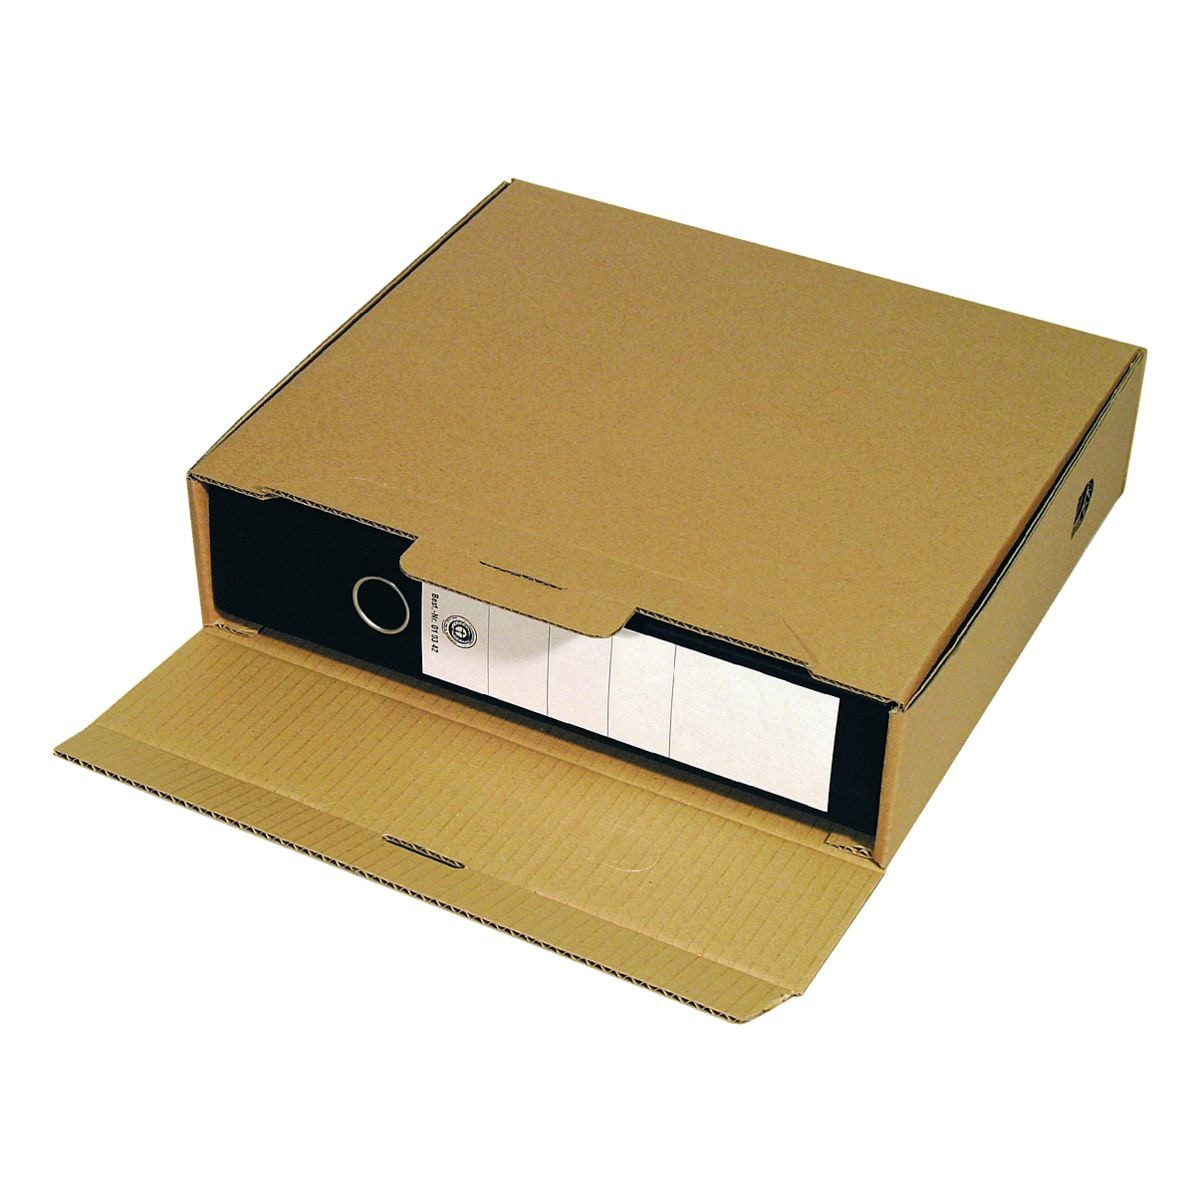 10er pack ordner versandkartons standard 7 4 l bei otto office g nstig kaufen. Black Bedroom Furniture Sets. Home Design Ideas